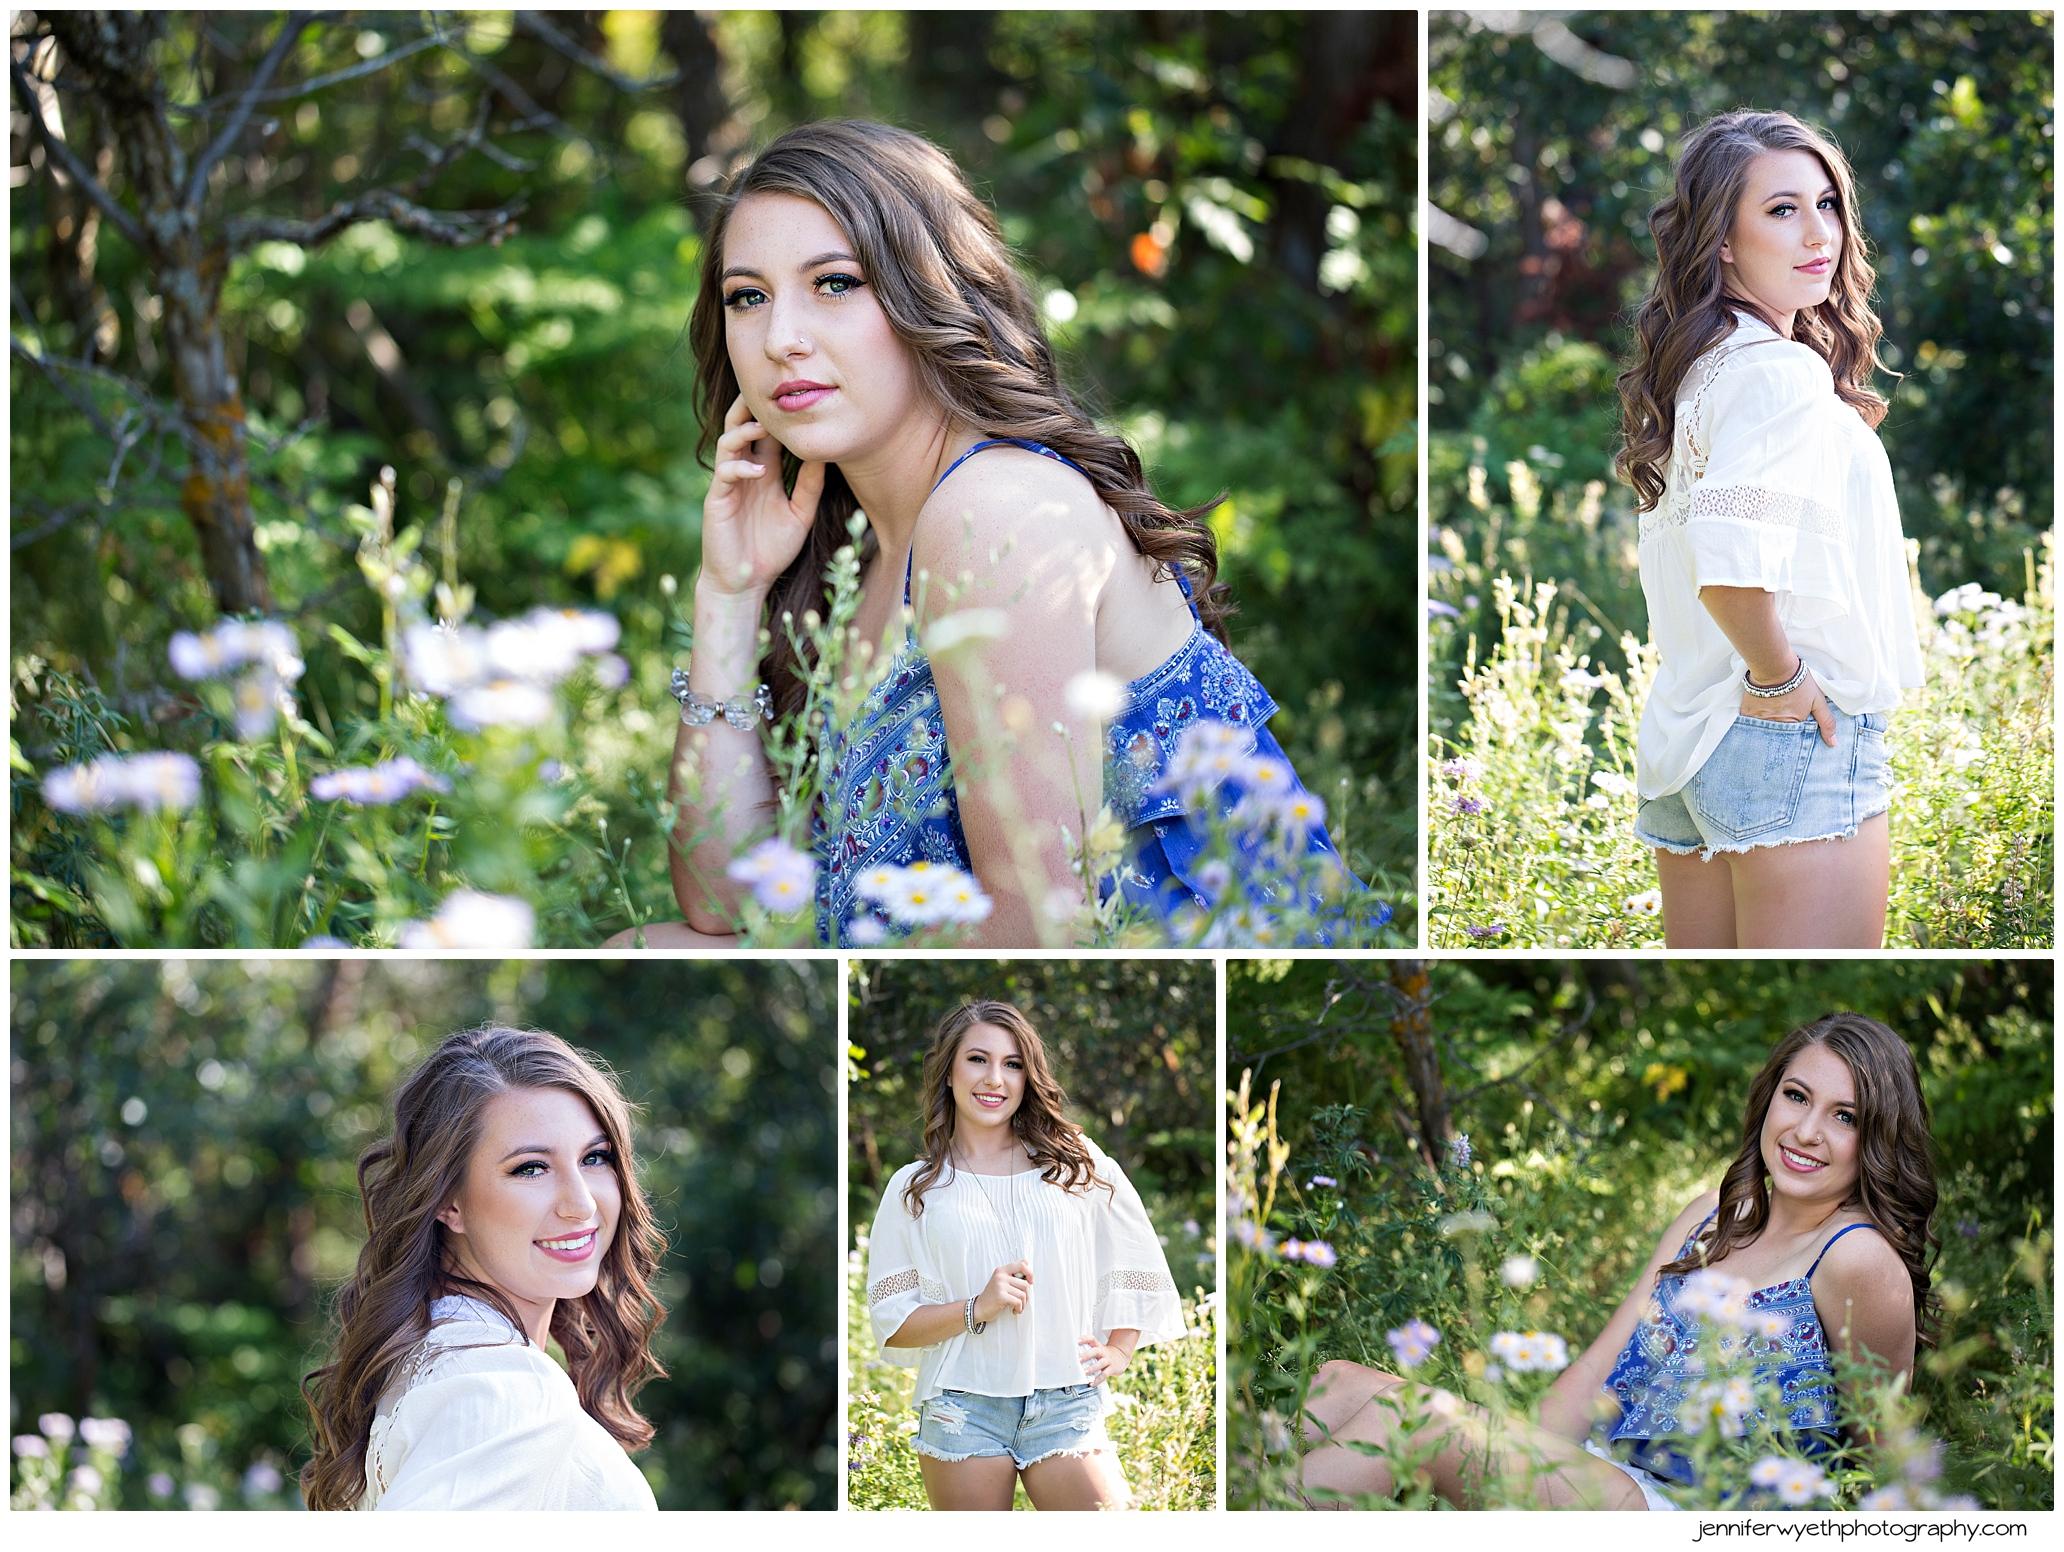 Jennifer-Wyeth-photography-senior-pictures-colorado-springs-photographer_0189.jpg